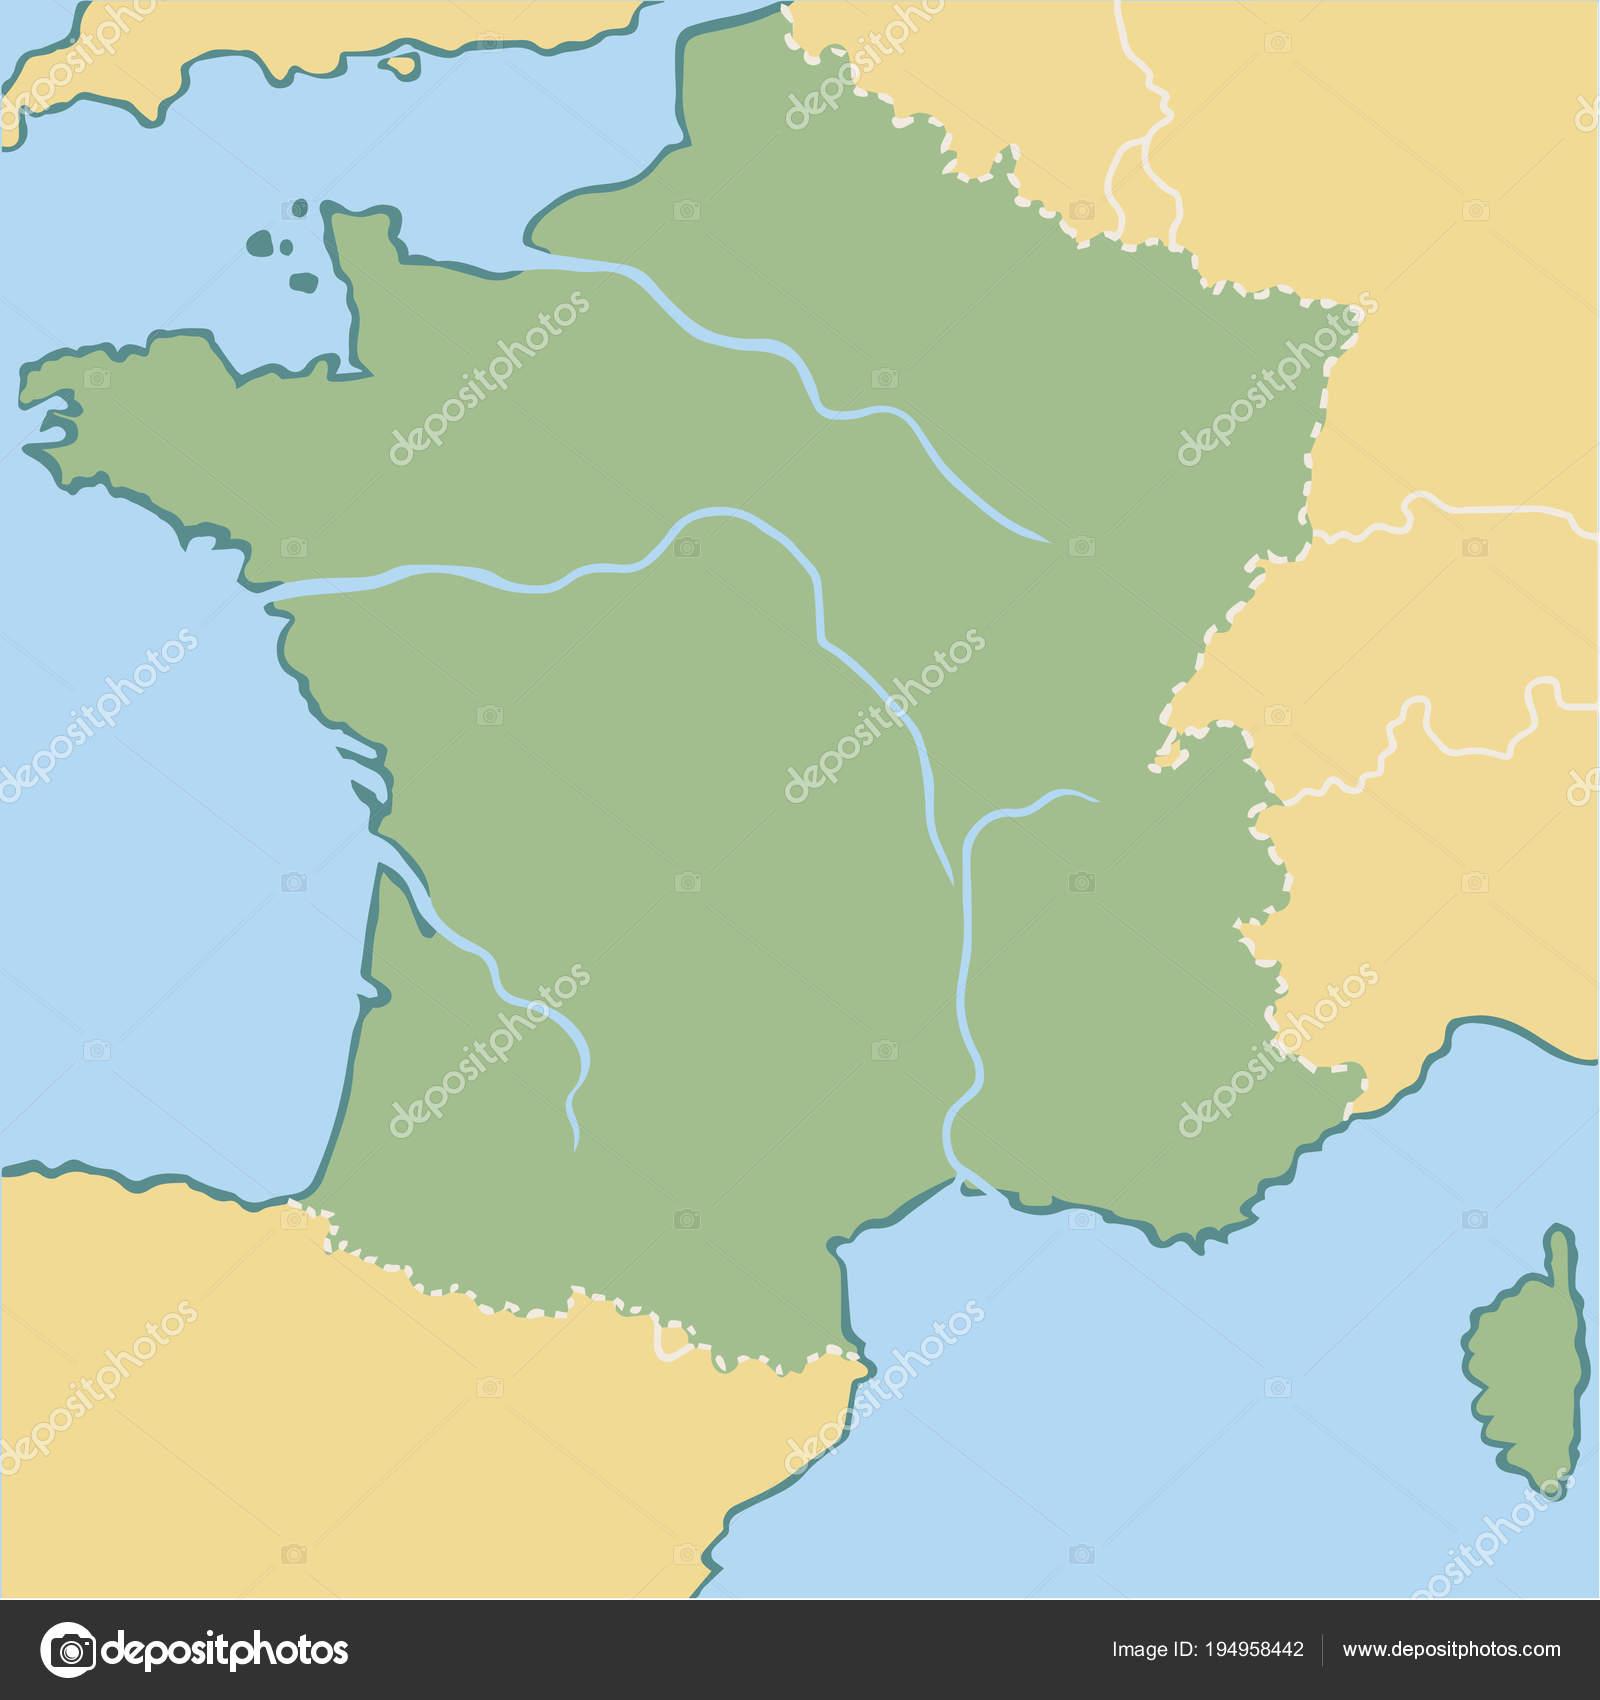 Map Of France Cartoon.Cartoon Map France Stock Vector C Lashmipics 194958442